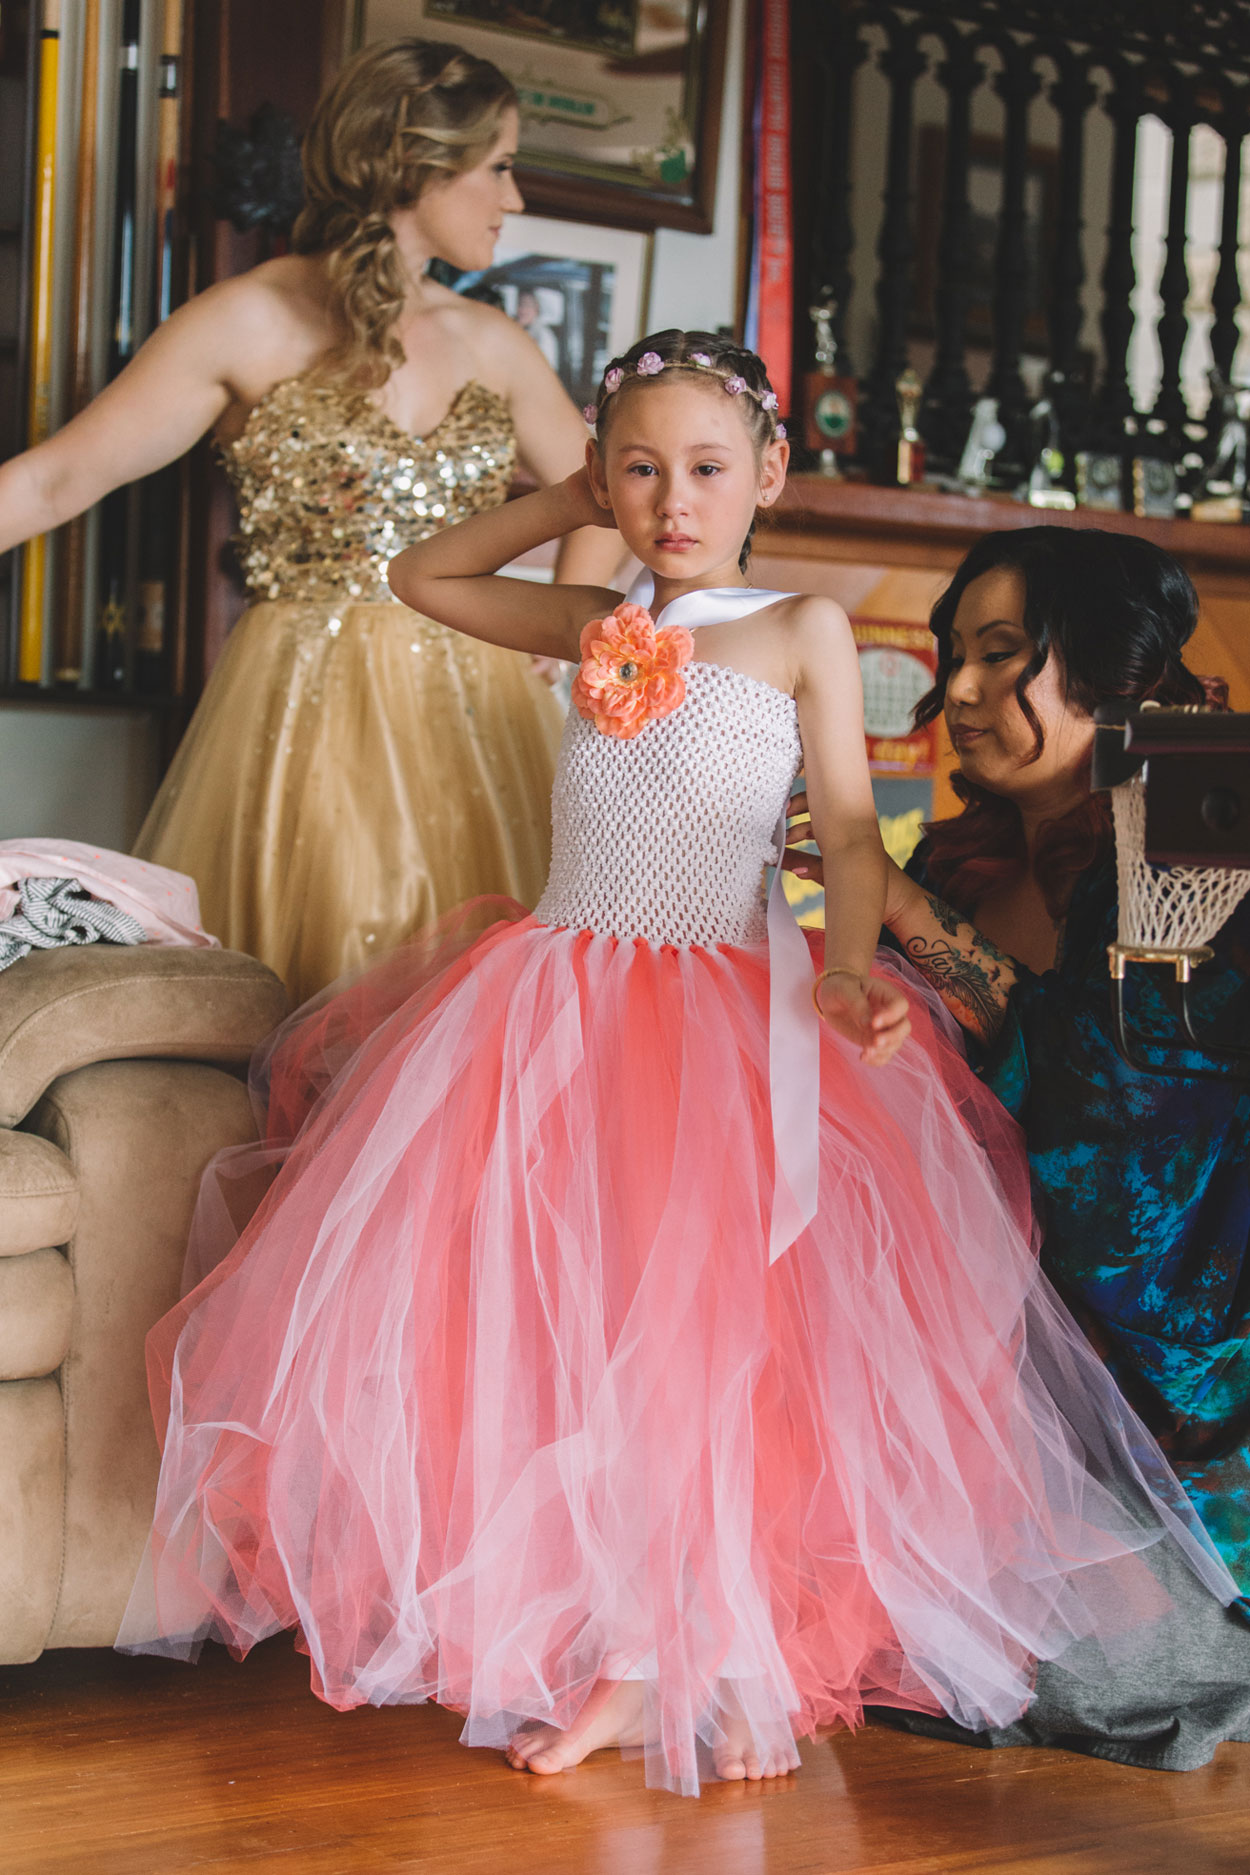 Family and Pre Destination Wedding Photographers, Noosa - Brisbane,Sunshine Coast, Australian Photography Elopement Packages